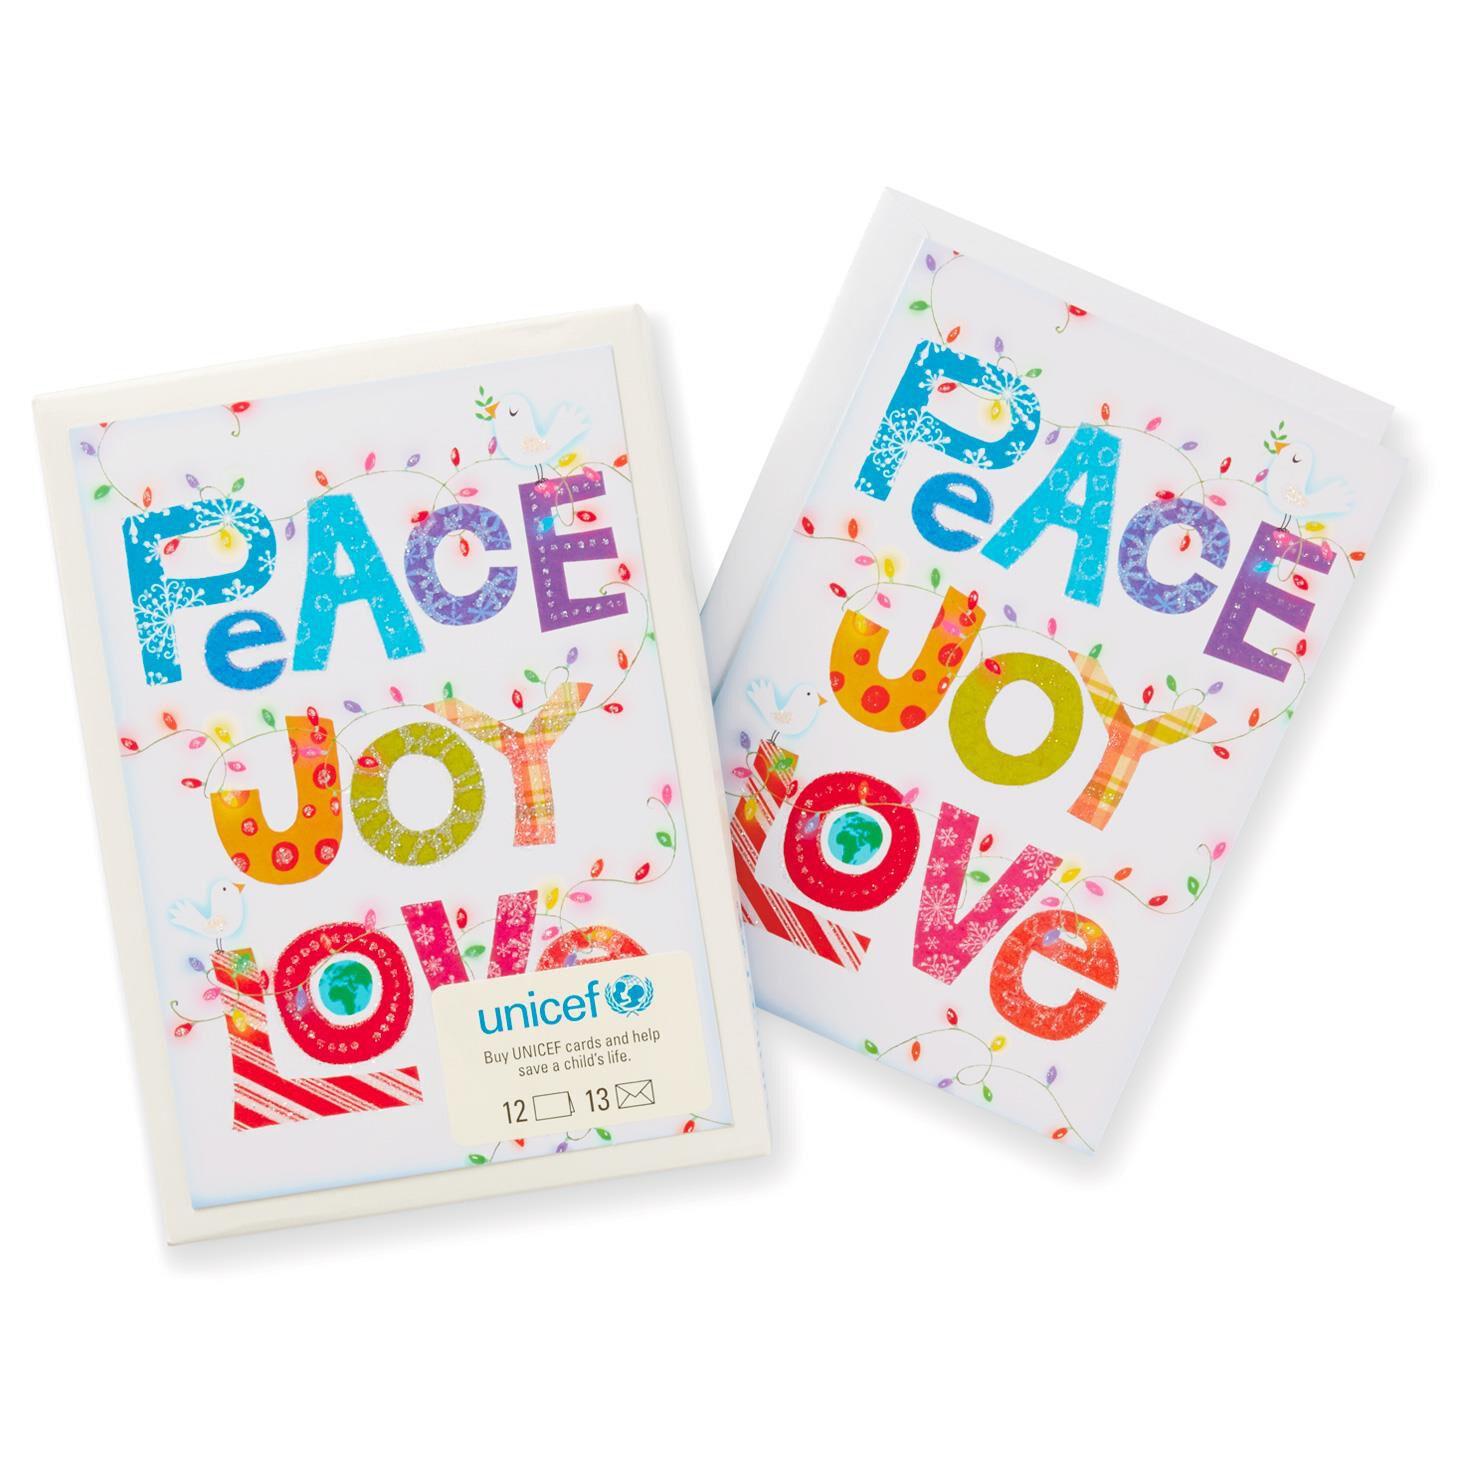 UNICEF Peace Joy Love Christmas Cards, Box of 12 - Boxed Cards ...